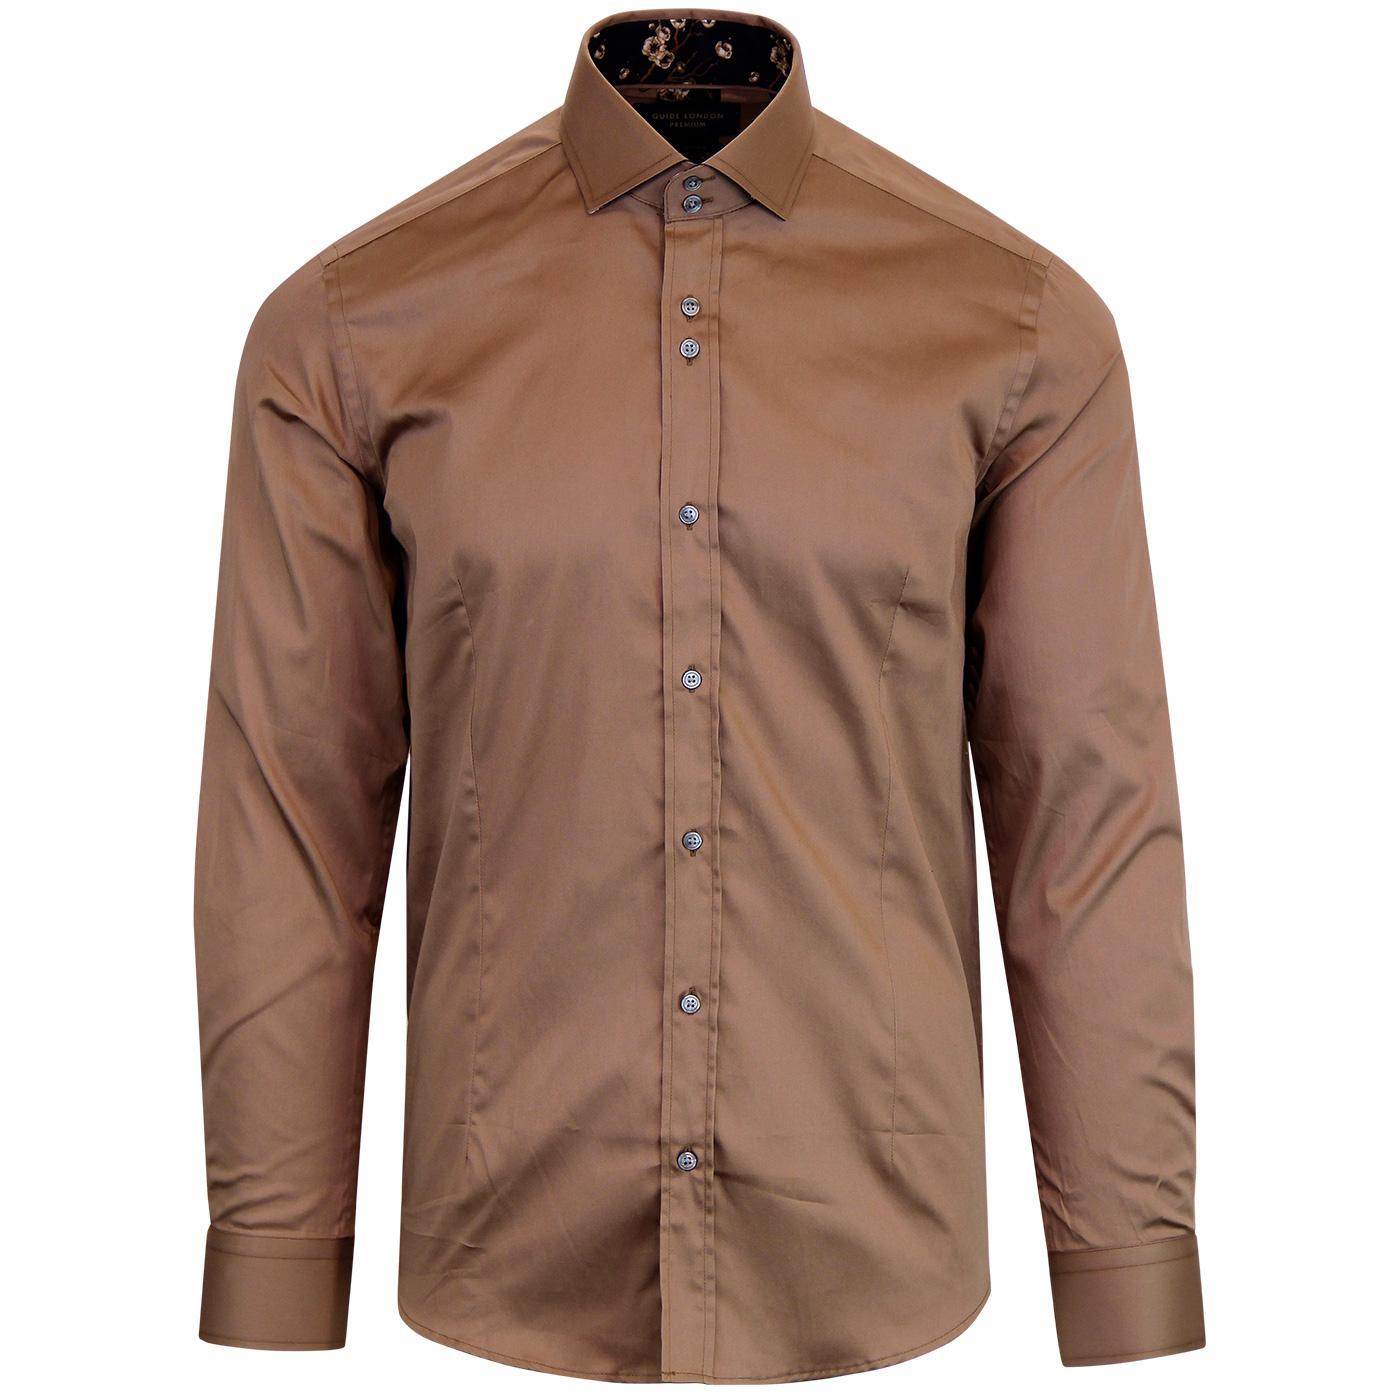 GUIDE LONDON Men's 60s Mod Smart Dress Shirt TAN